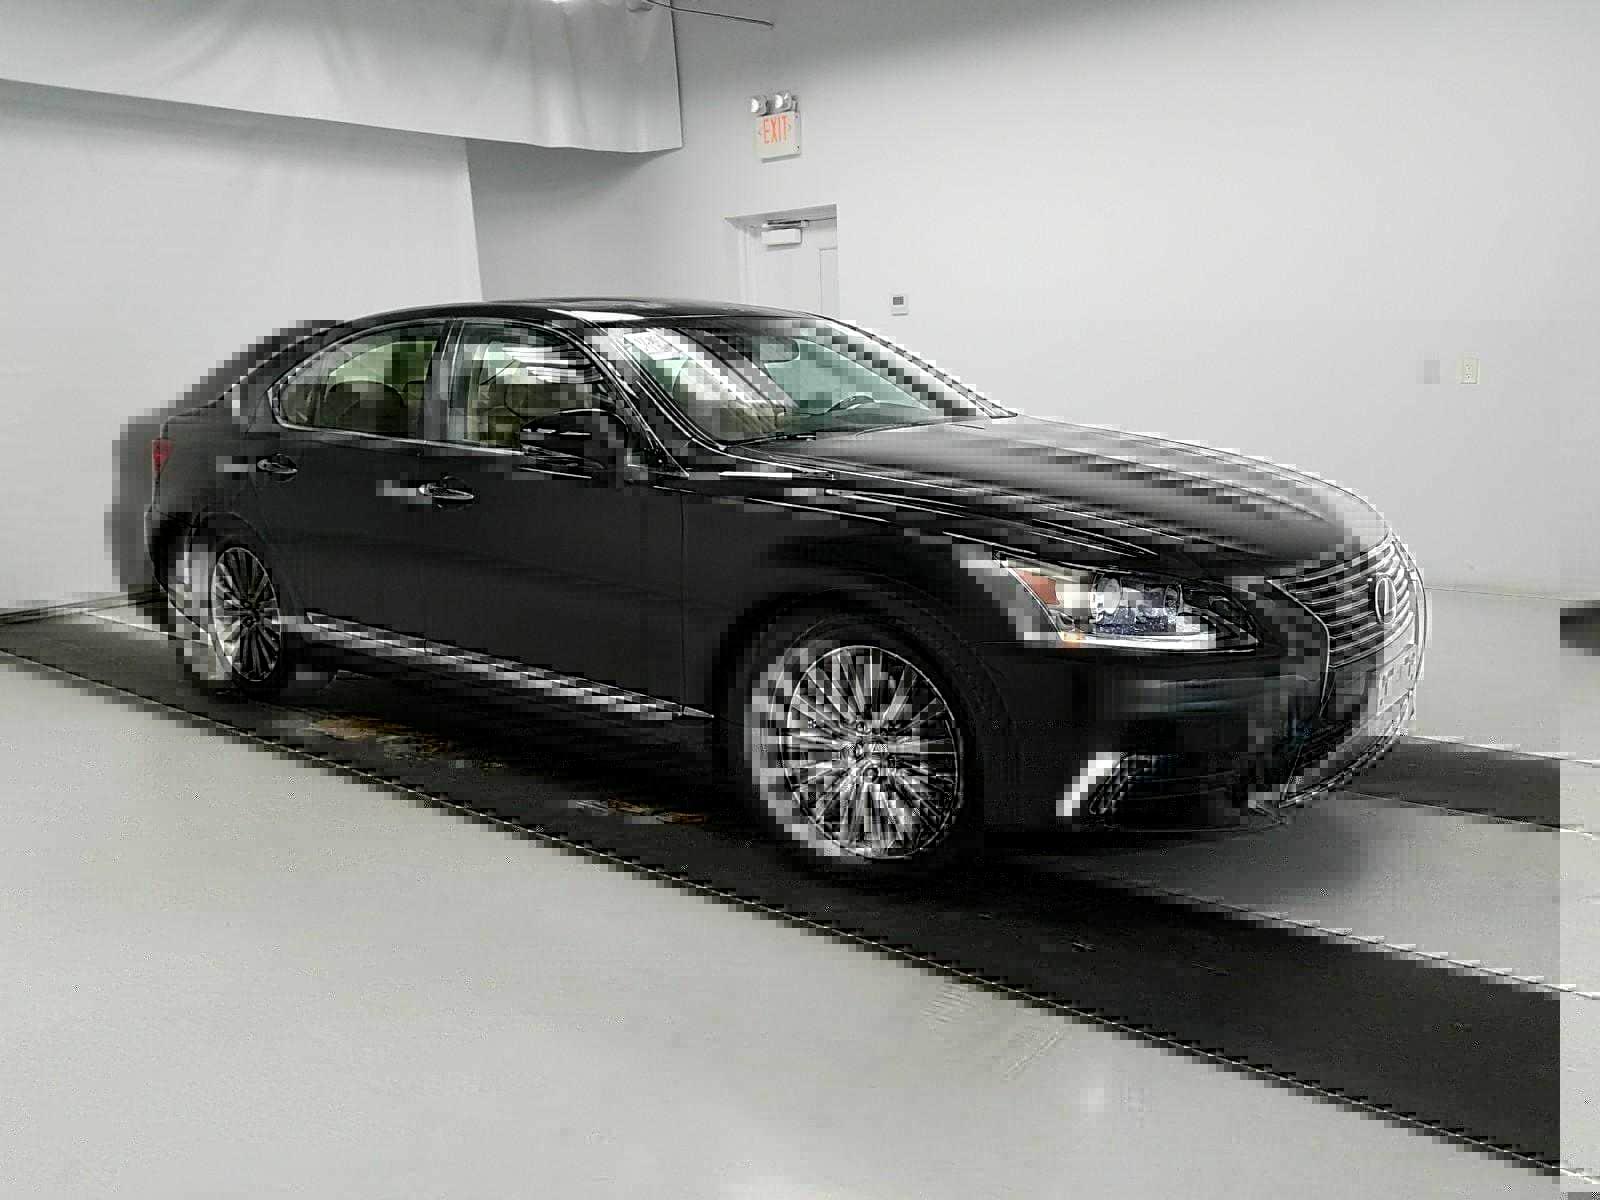 New Lexus side view